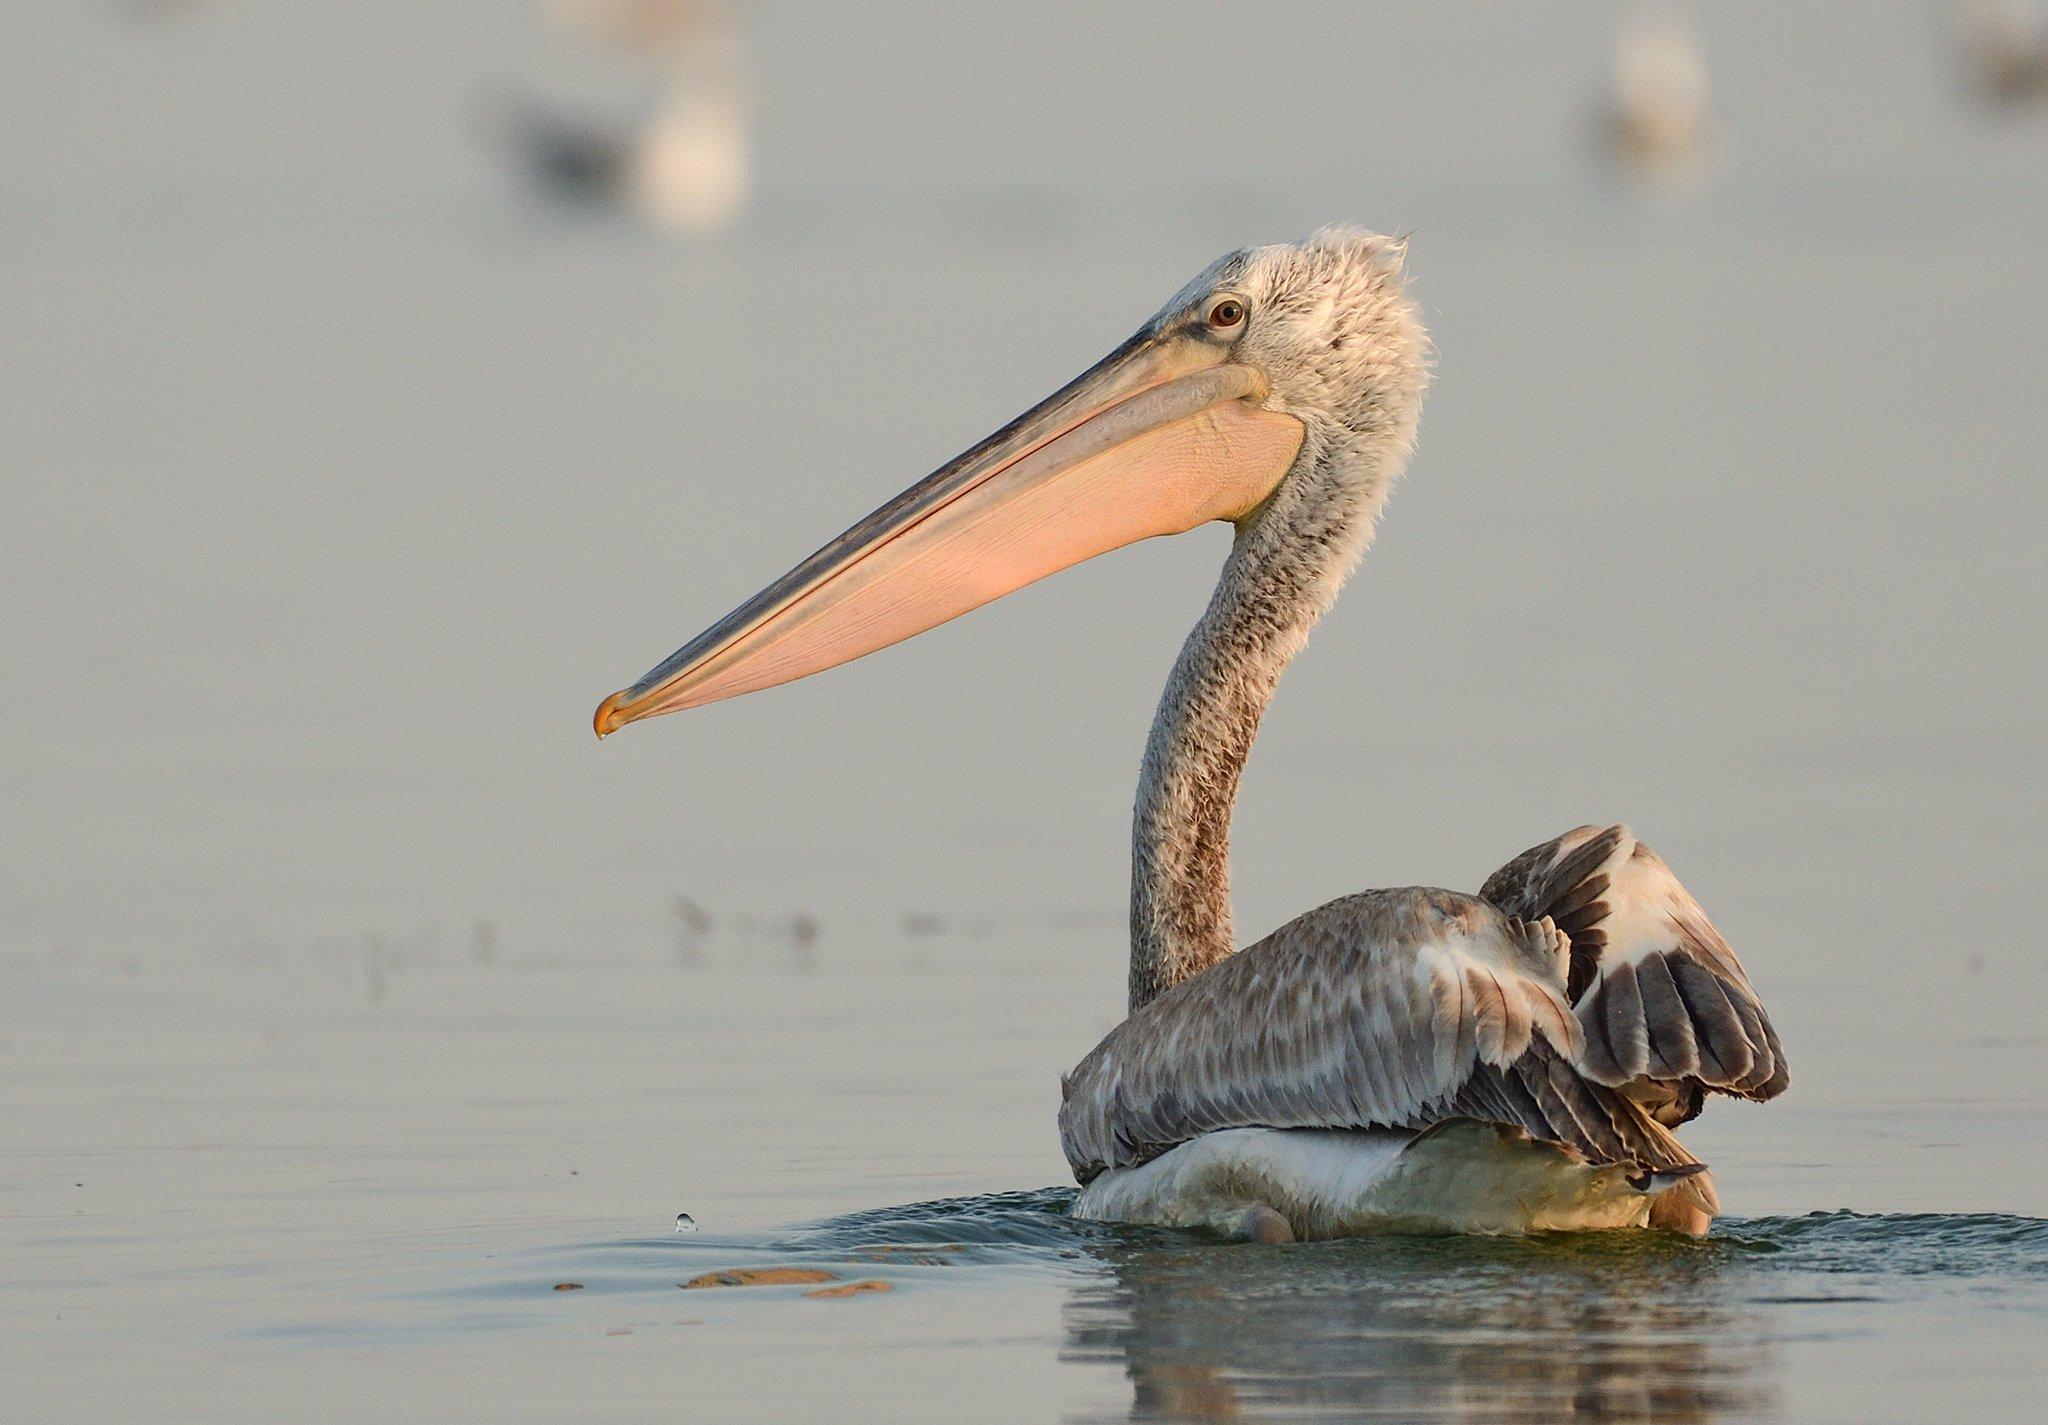 bird, birds, nature, wild, wildlife, natural, pelikan, animal, lake, water, Димитър Русев